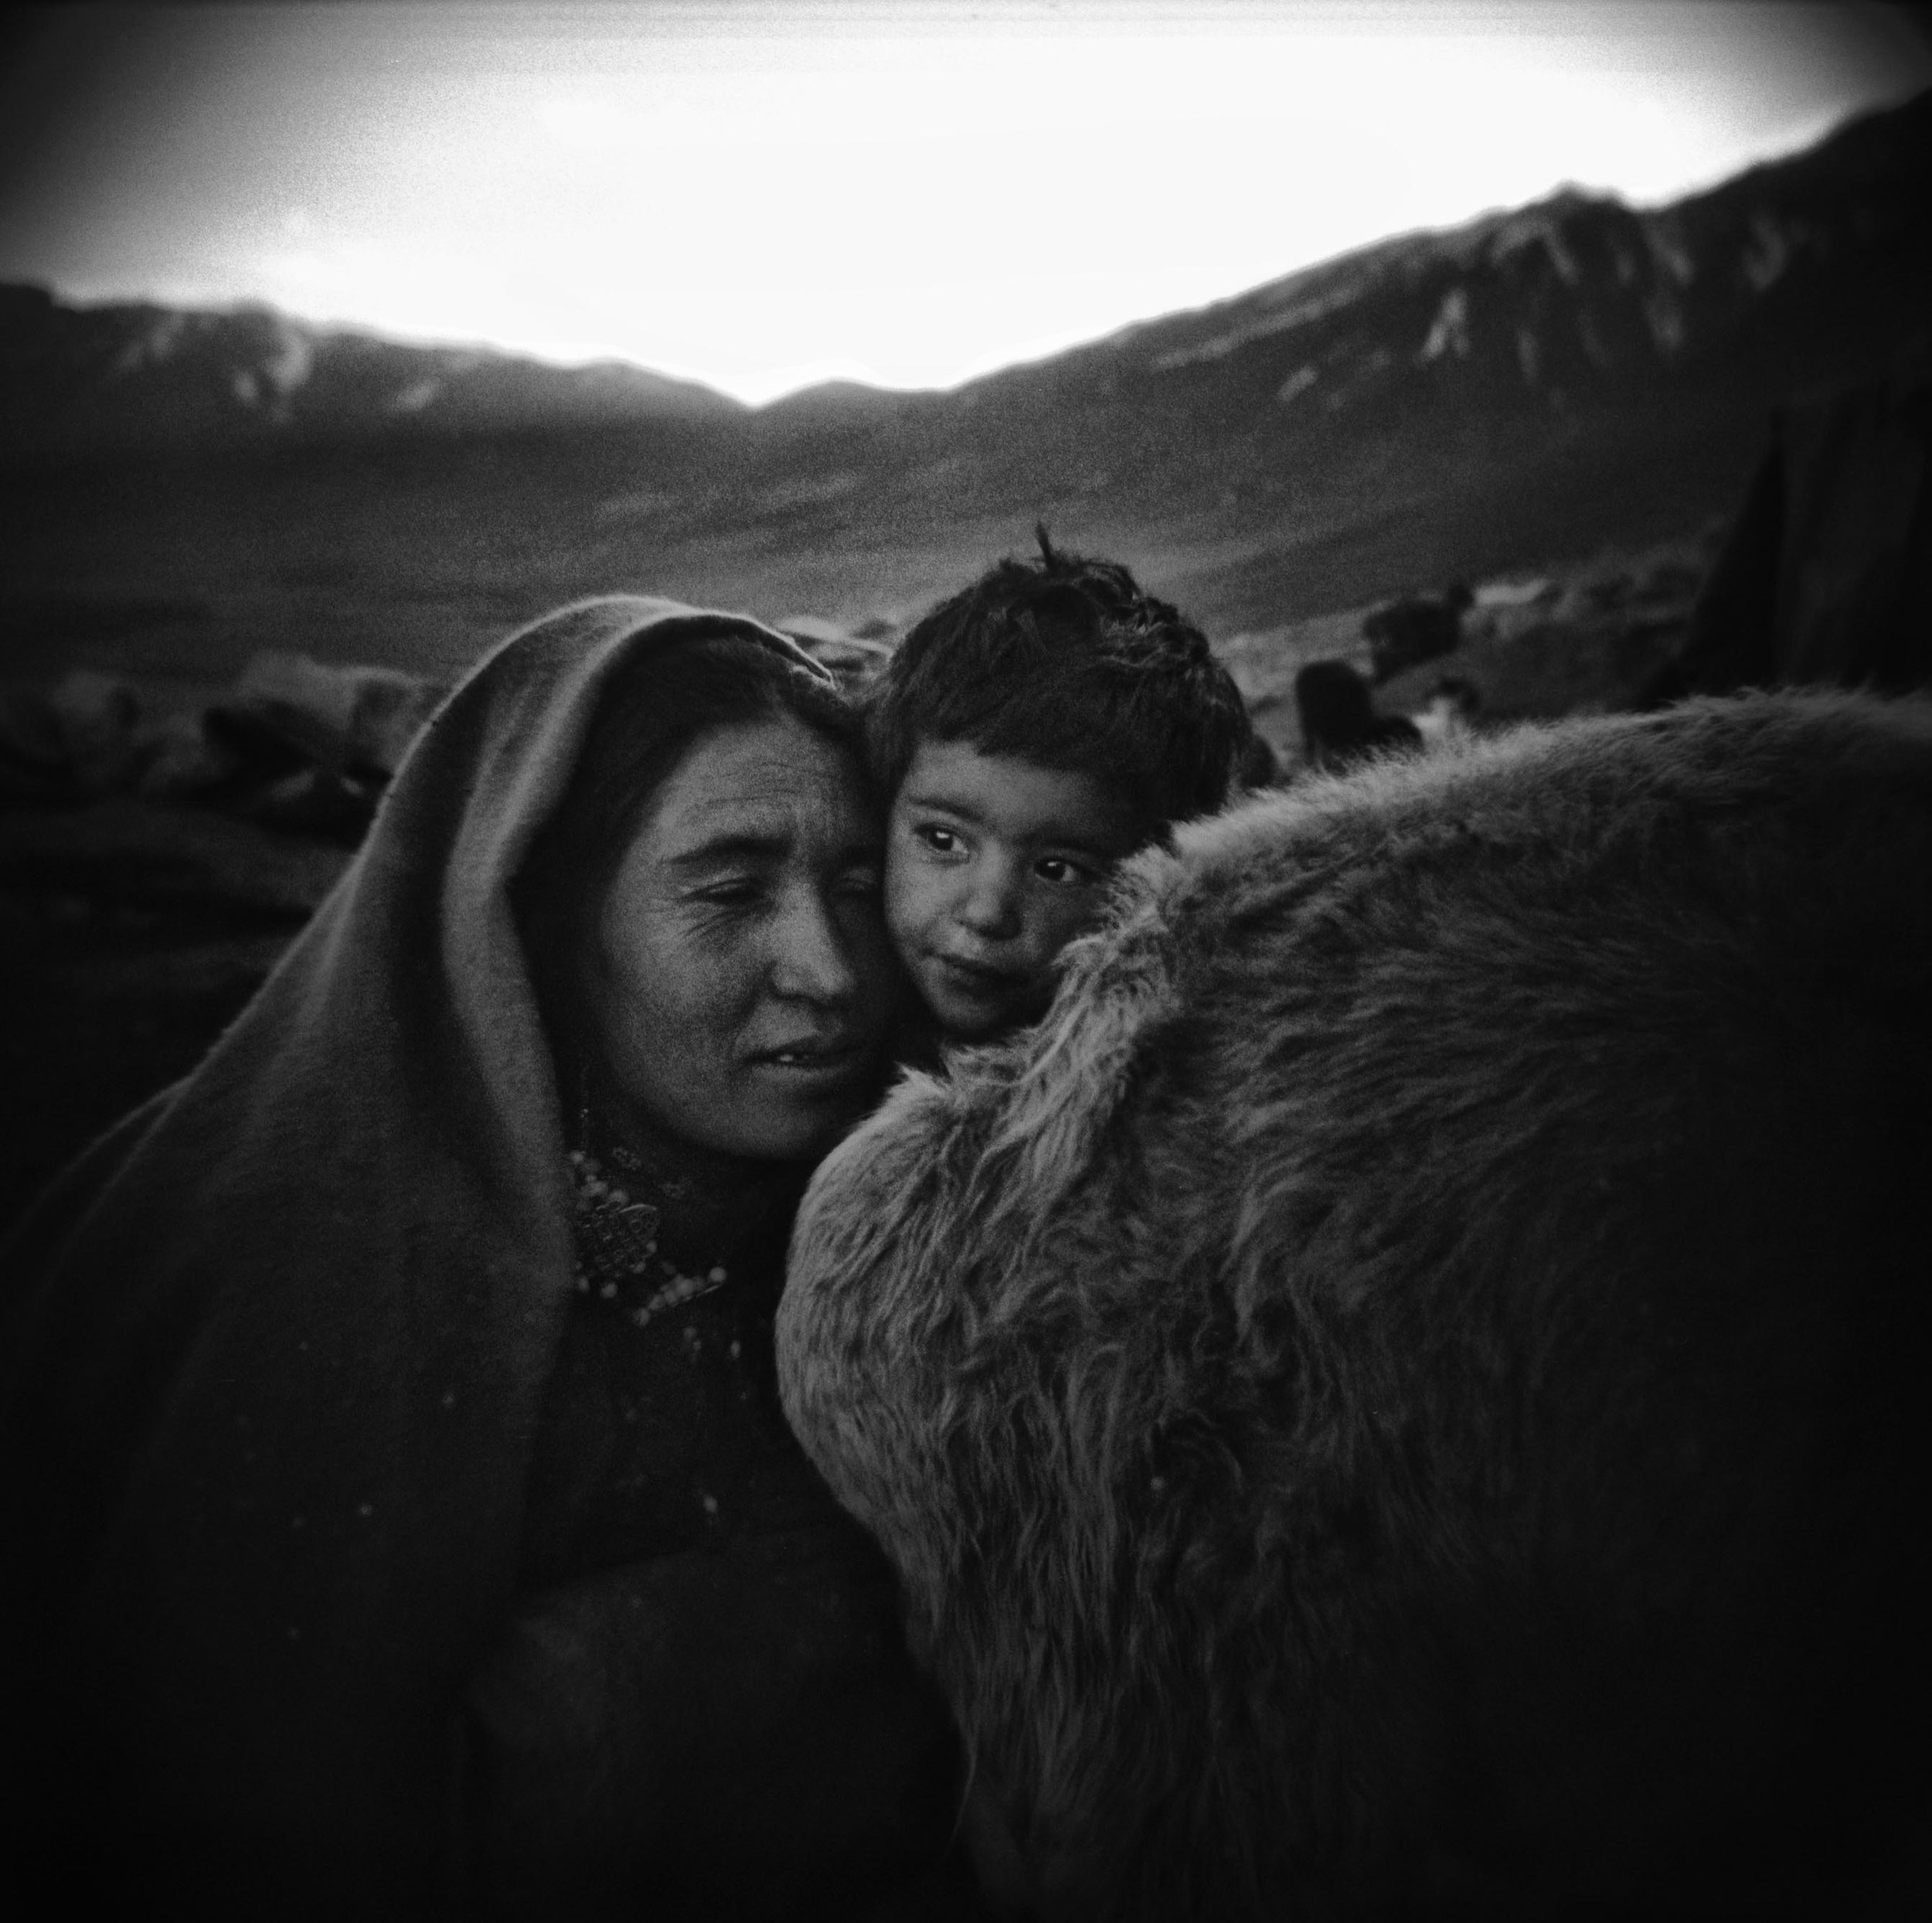 22-mother&child-Holga273-contrastII-bewA-web.jpg